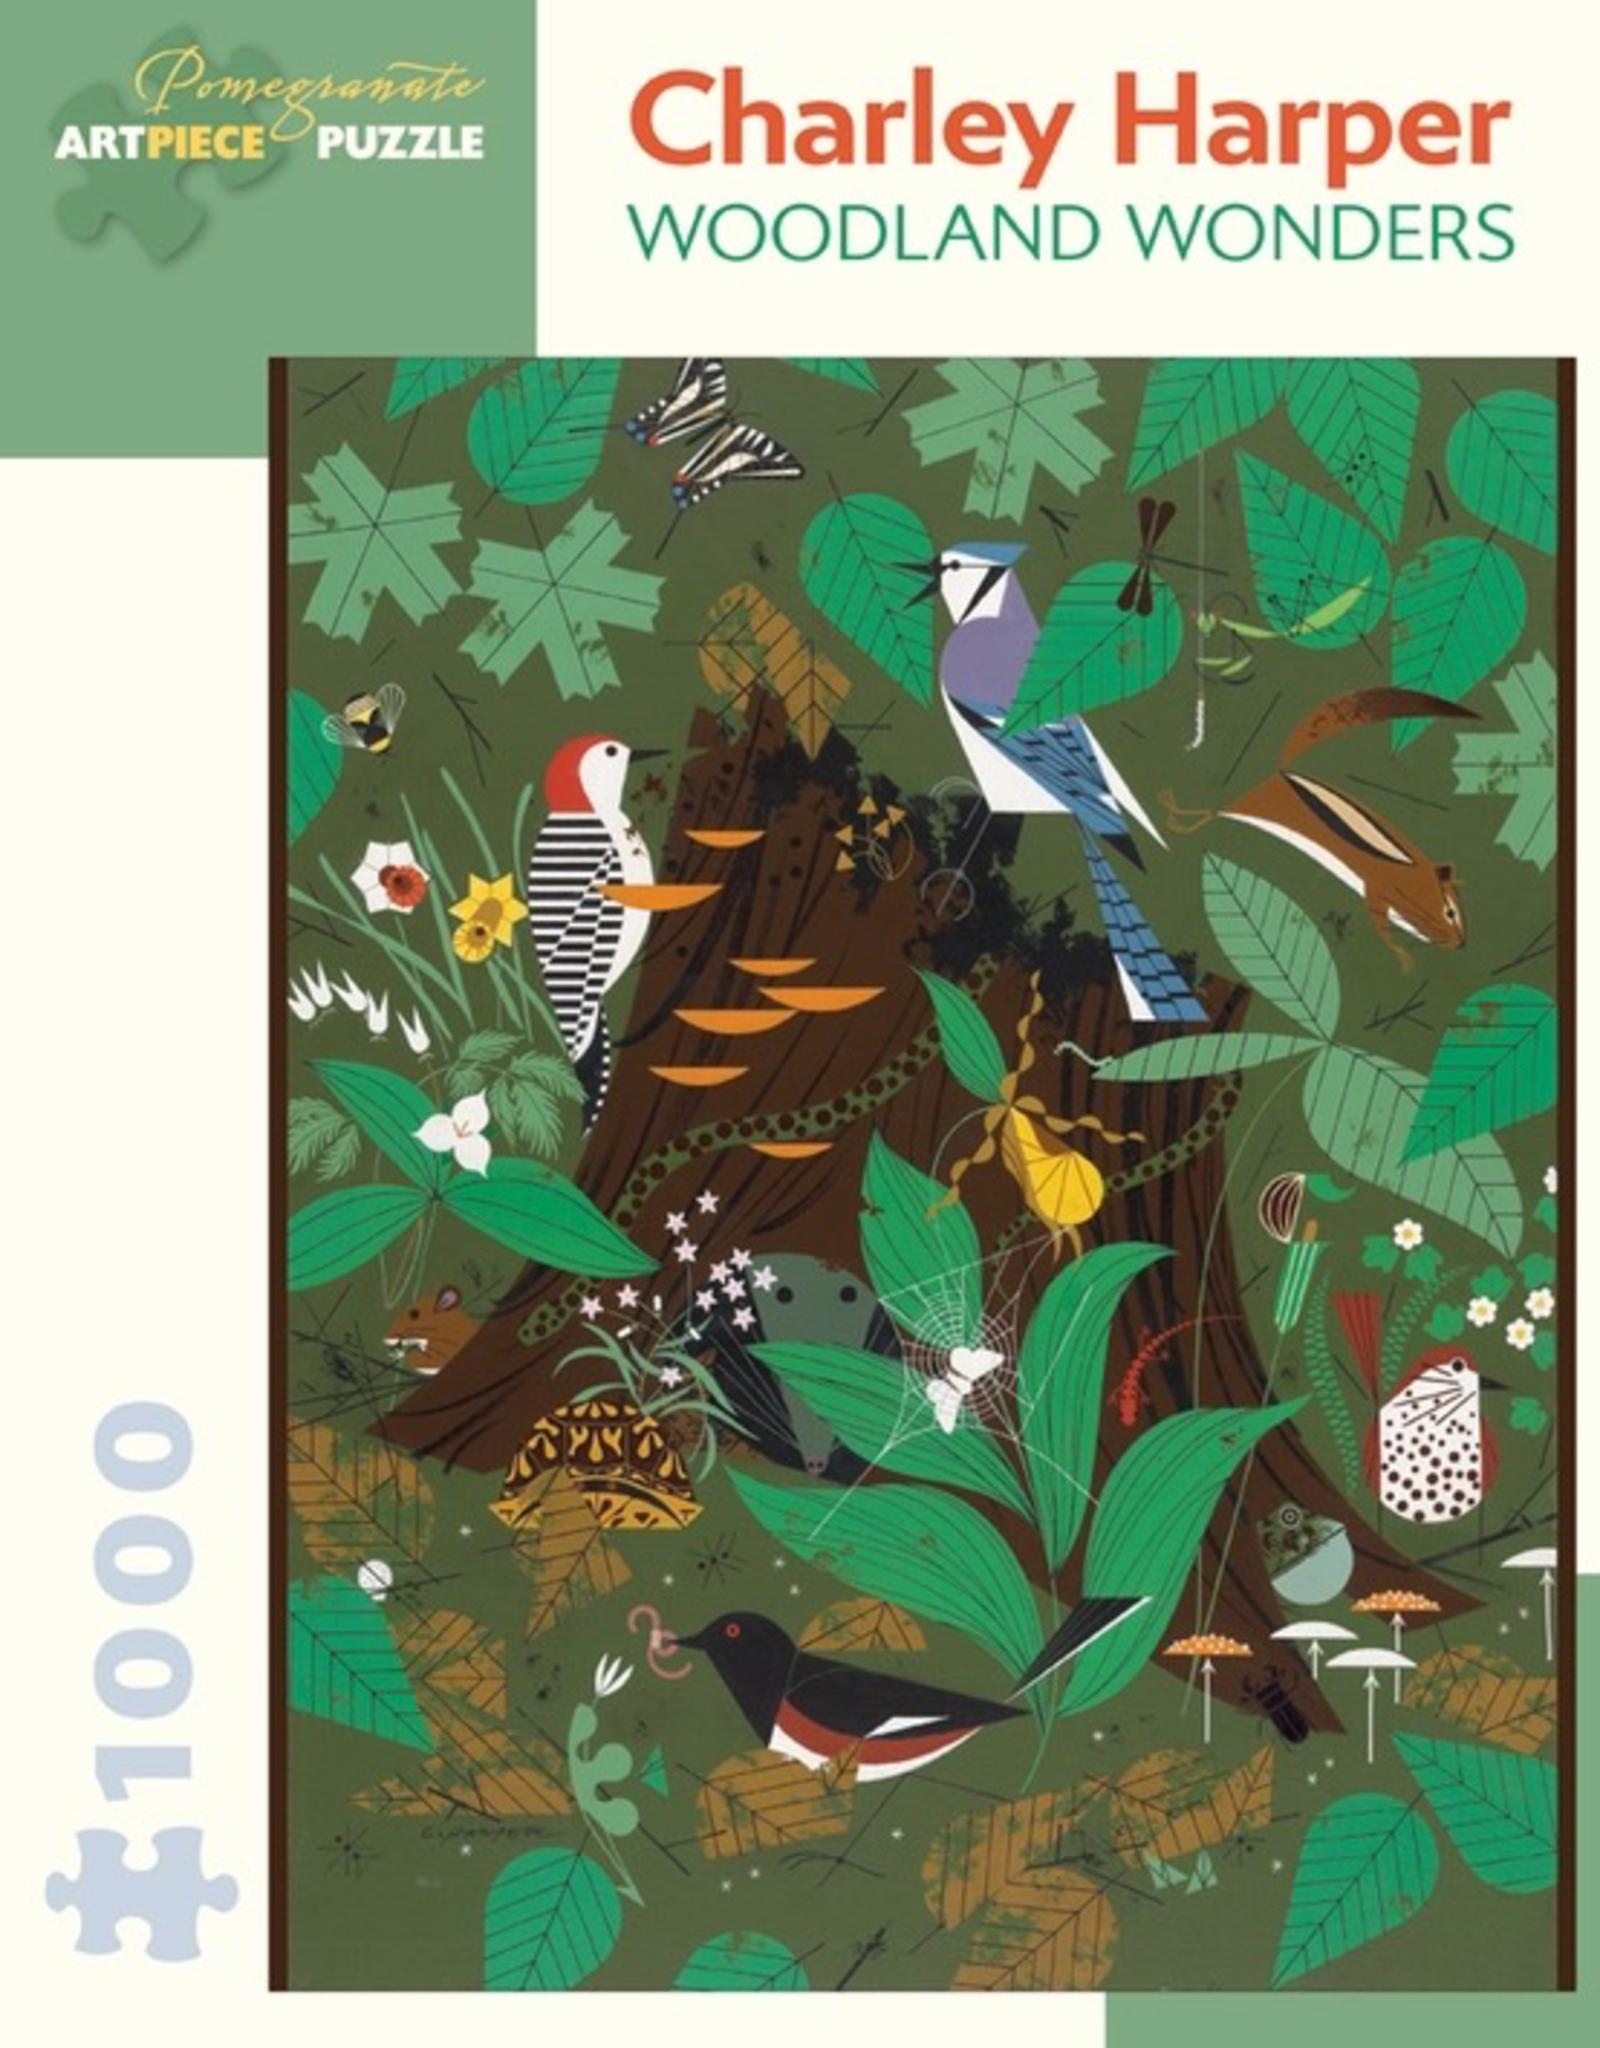 POMEGRANATE Charley Harper: Woodland Wonders 1000-pc Puzzle